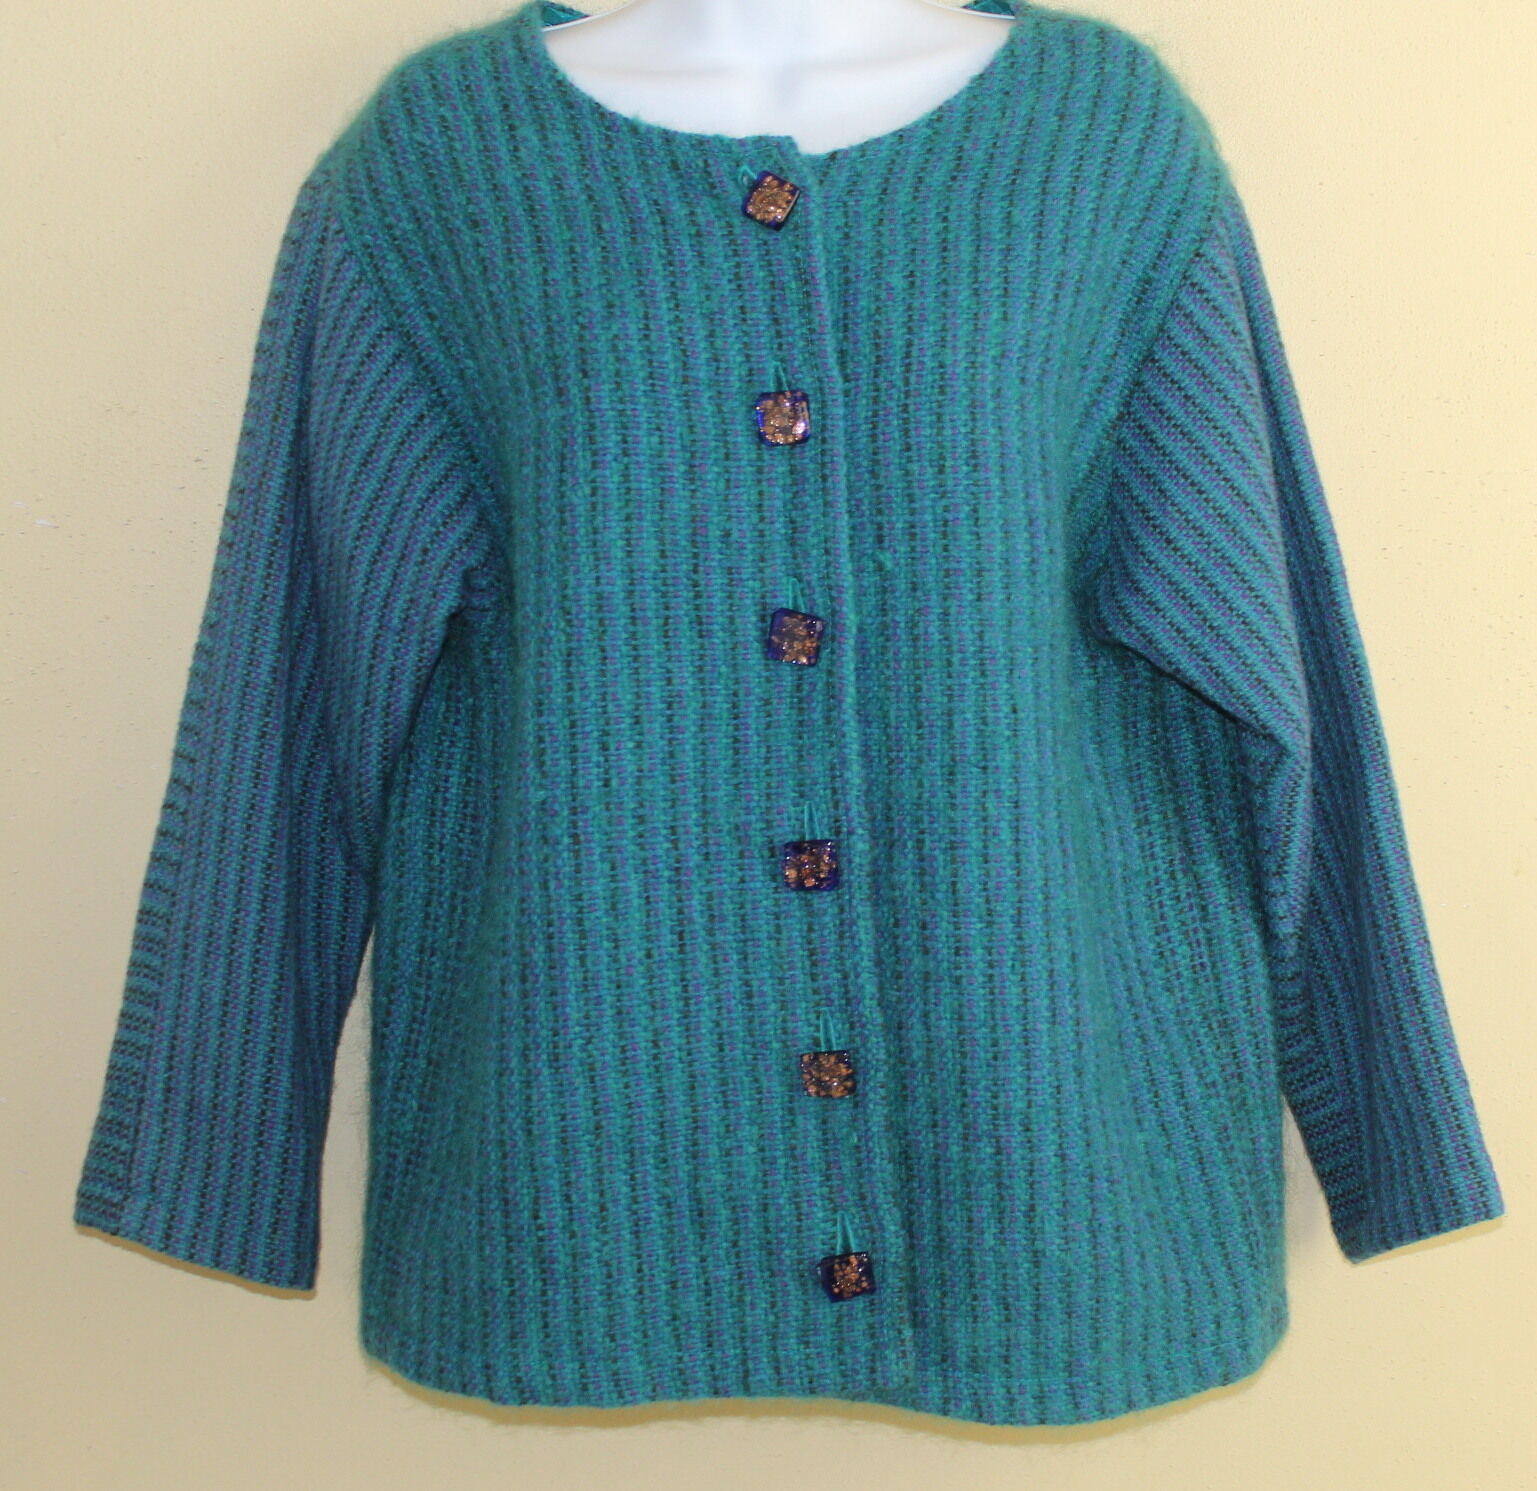 Opalessence Fibra tejida  a mano Art para llevar Cerceta Azul artista Enjoyado Chaqueta Sz S M  en venta en línea